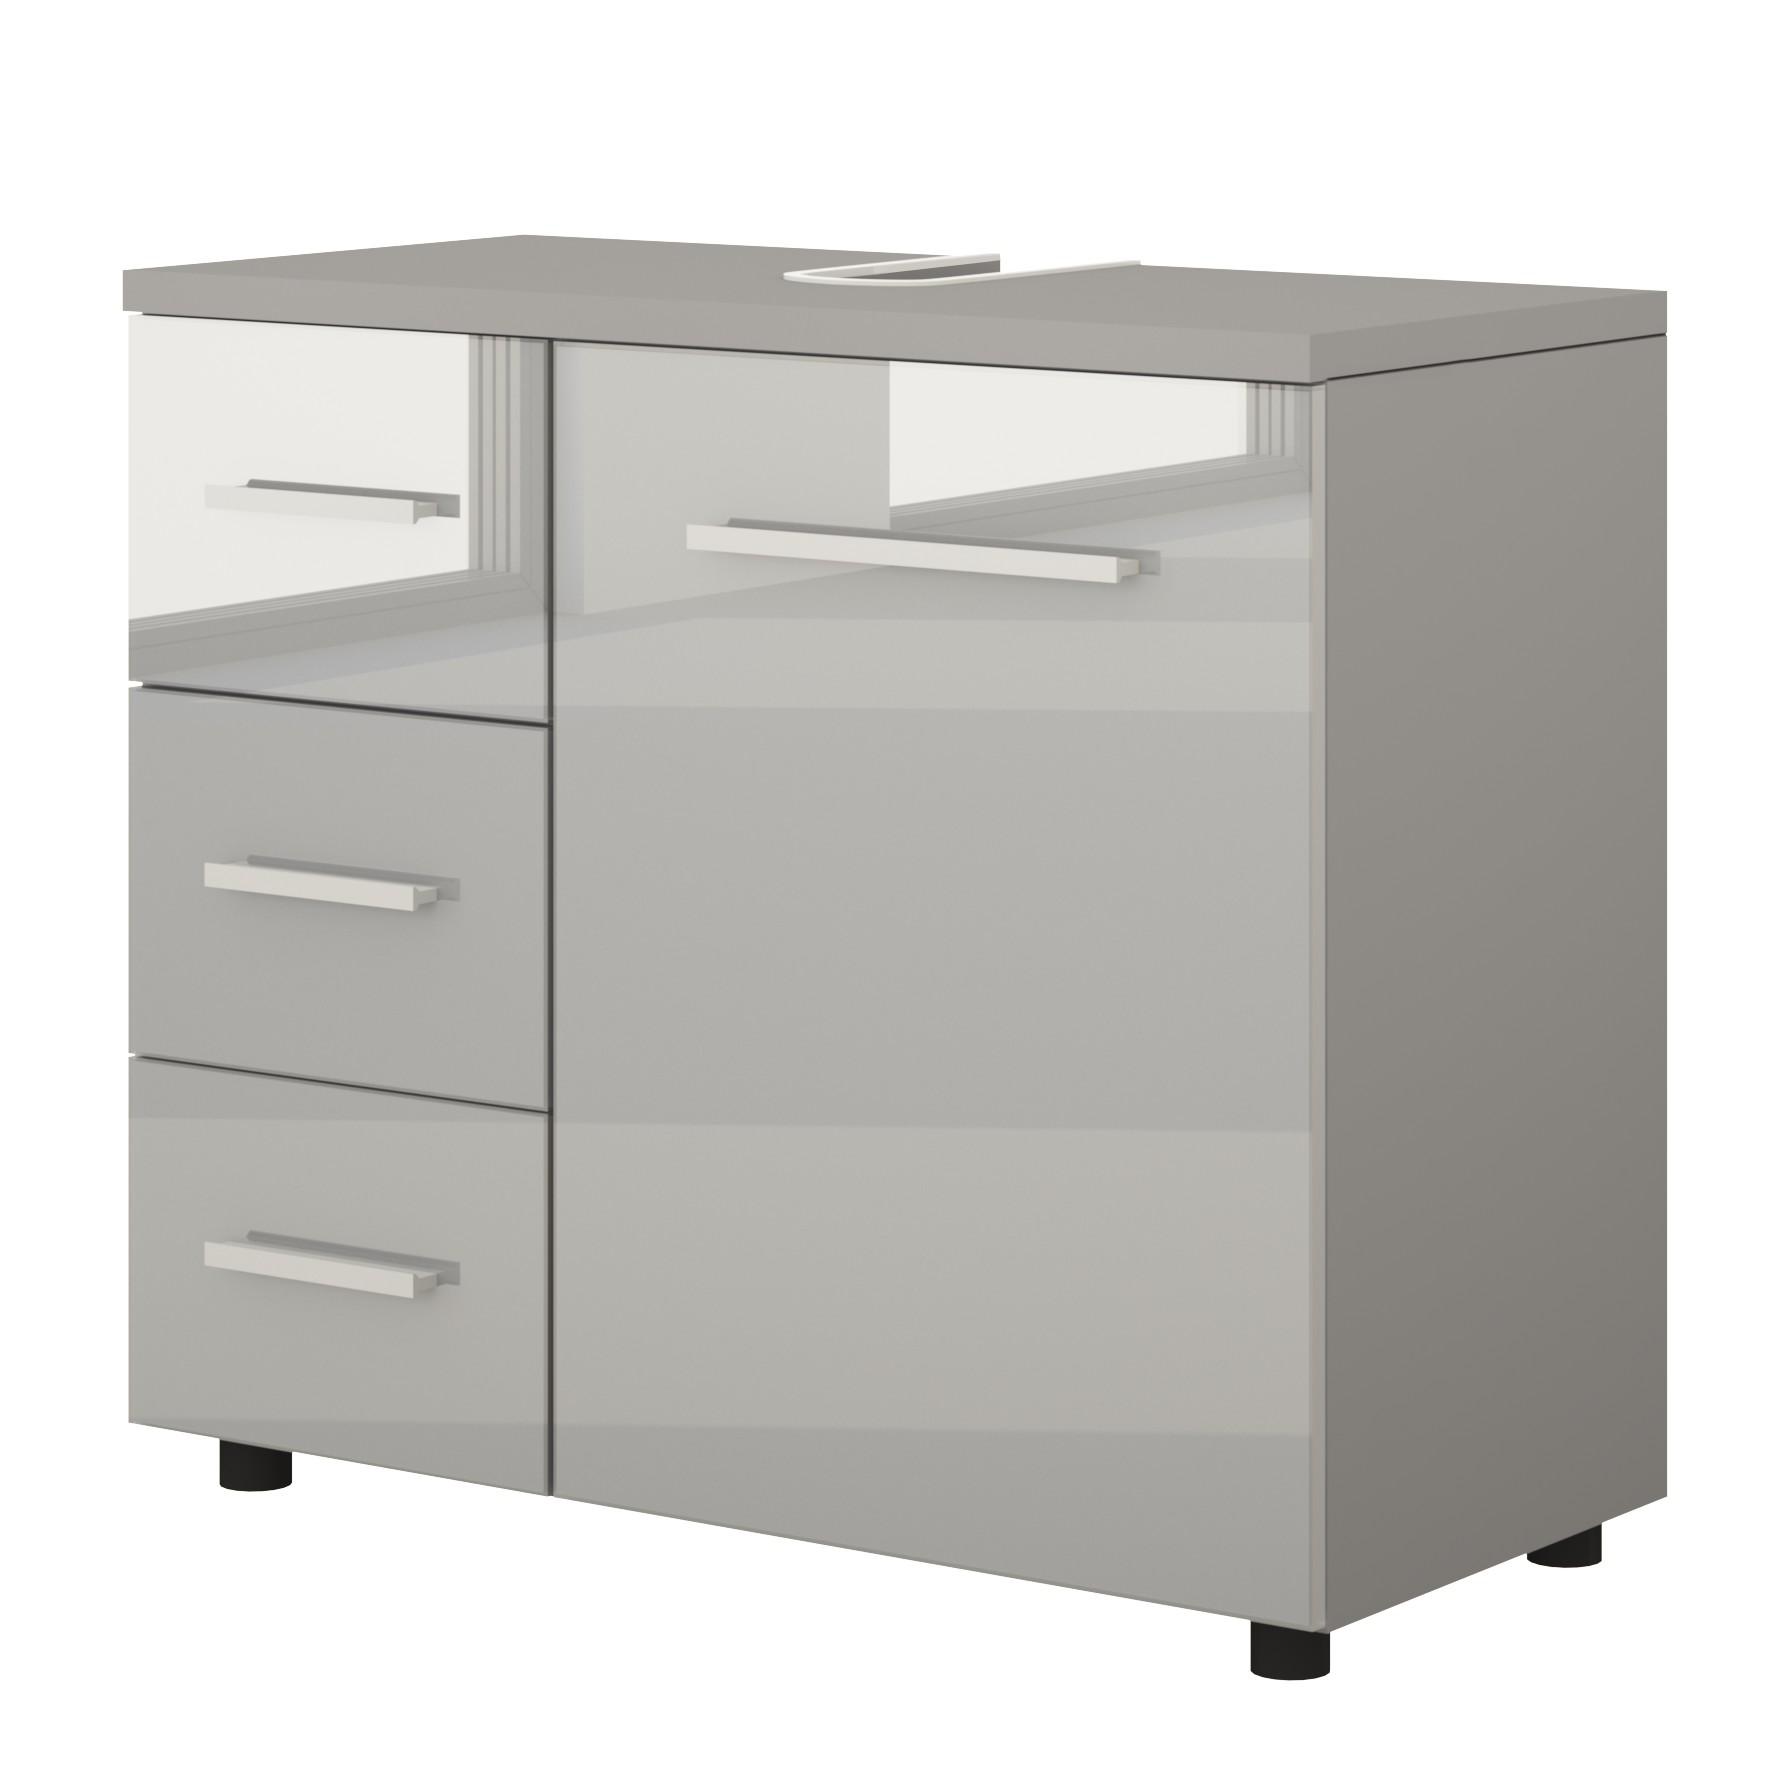 spanplatten 11230 angebote auf find. Black Bedroom Furniture Sets. Home Design Ideas